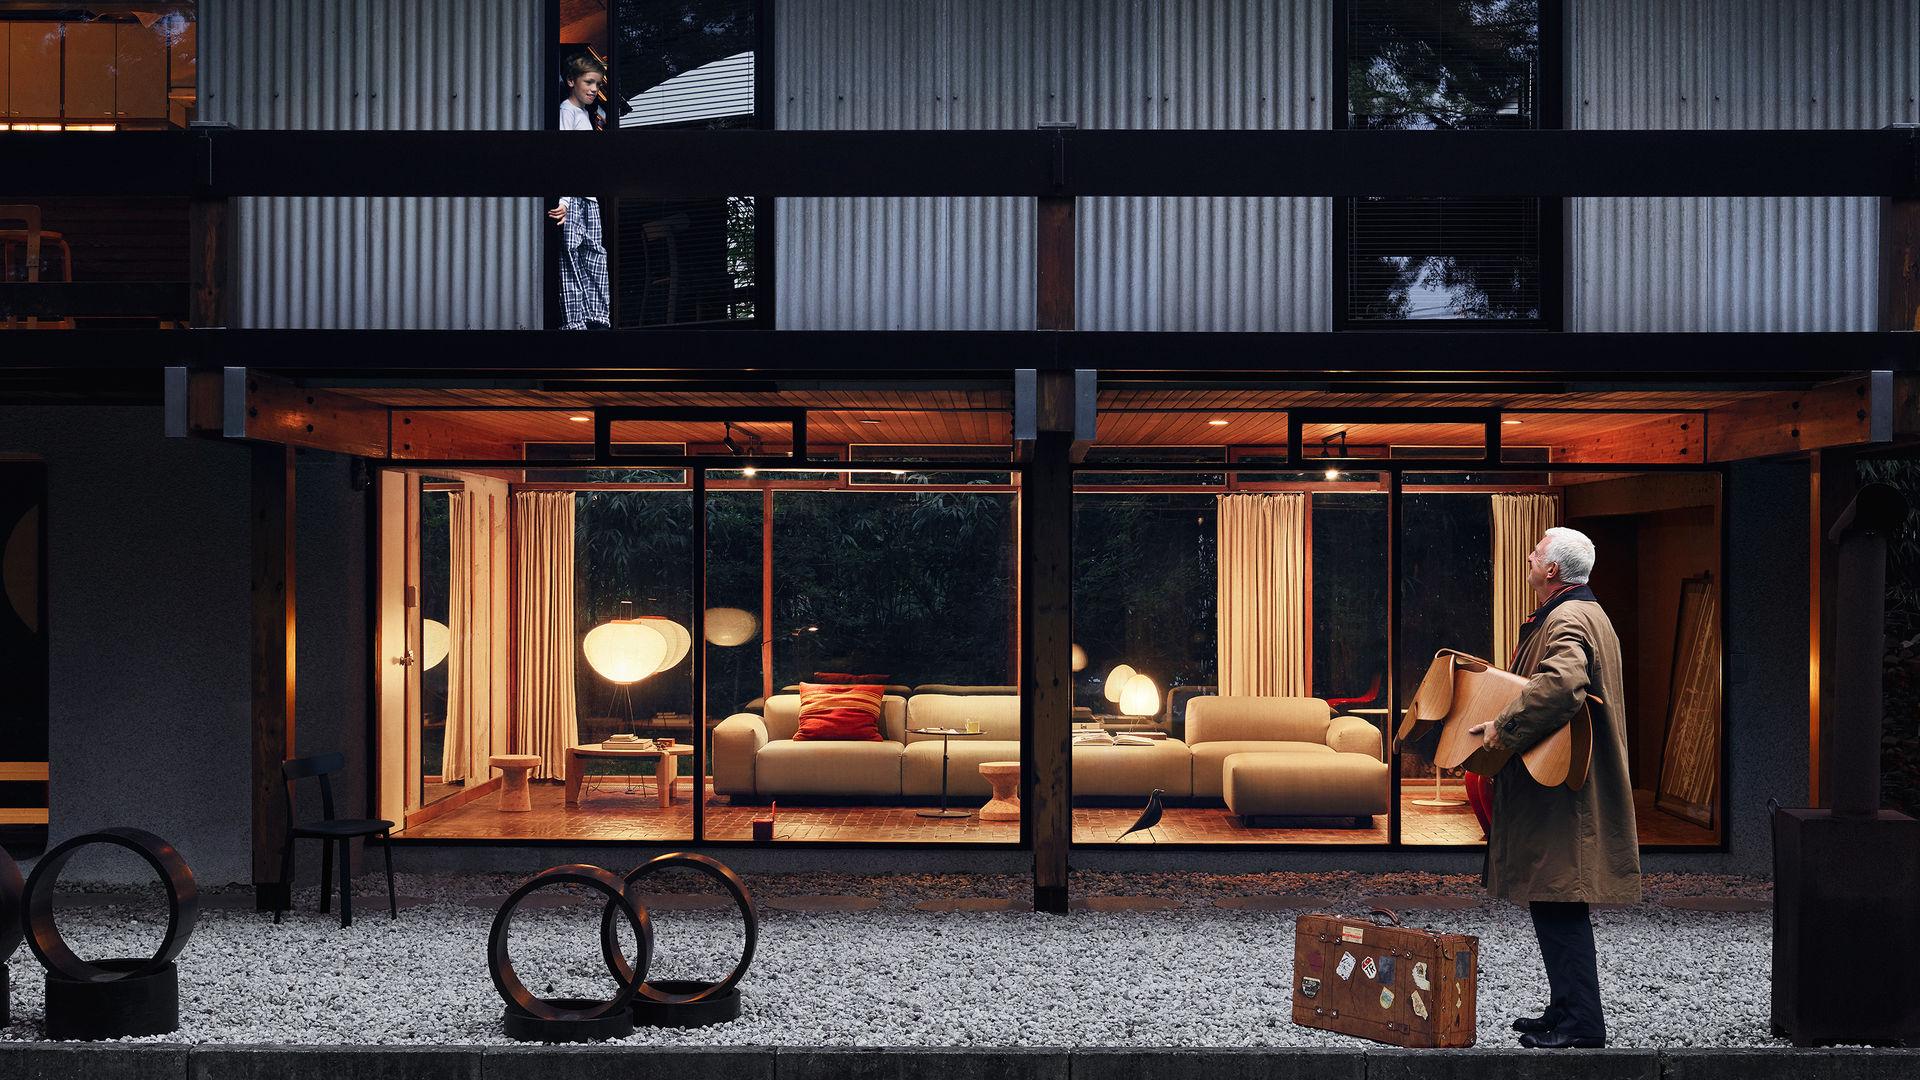 Eames Elephant (Plywood) Soft Modular Sofa Cork Family Akari 10A Guéridon Bas_web_16-9